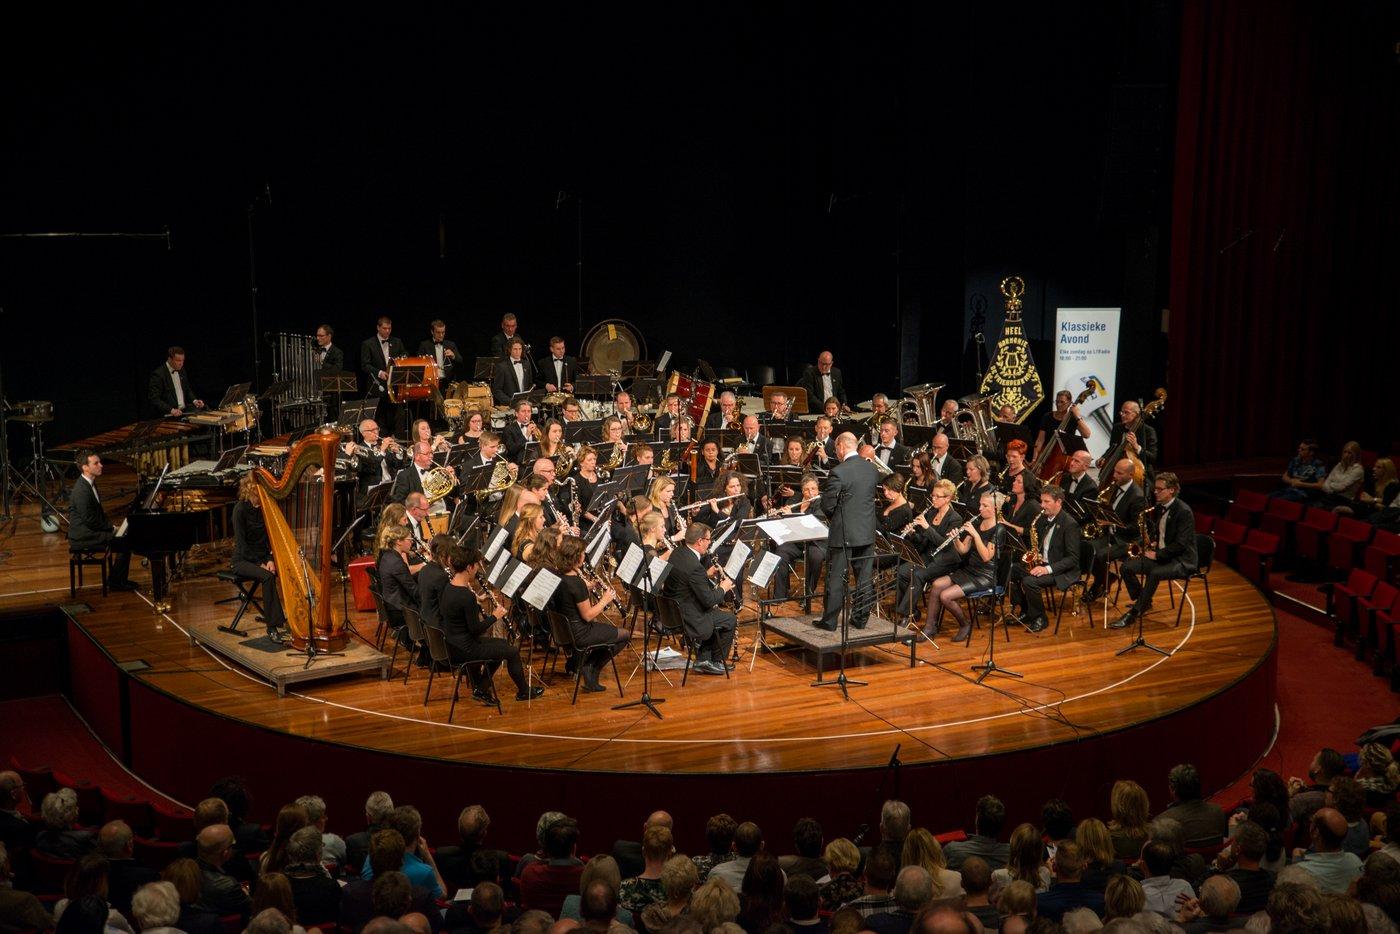 Harmonie de Vriendenkrans: 'grote harmonie' o.l.v. Martien Maas in De Oranjerie (Bondsconcours 2015)